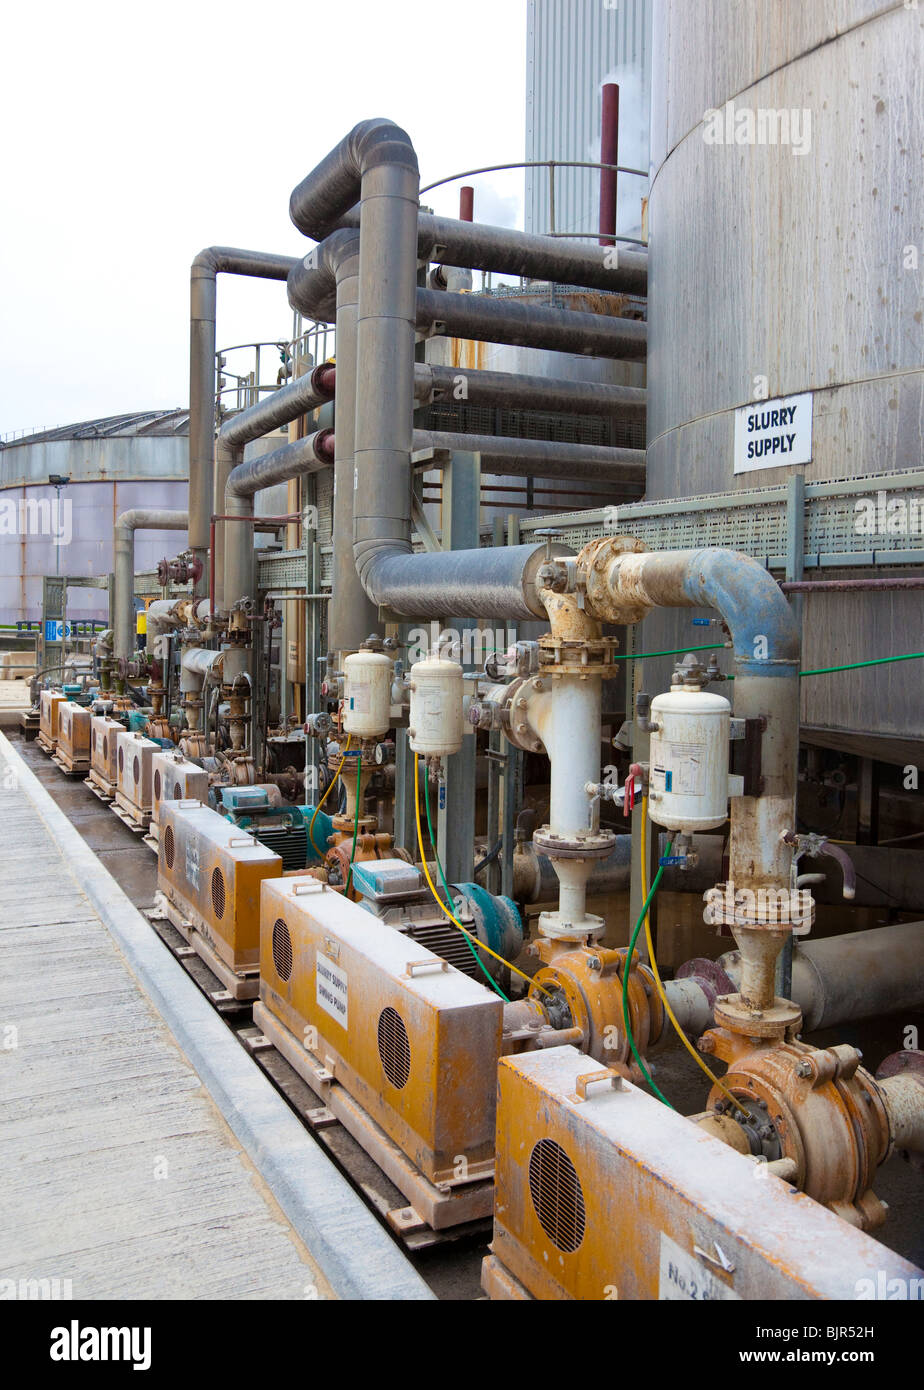 industrial pumps - Stock Image